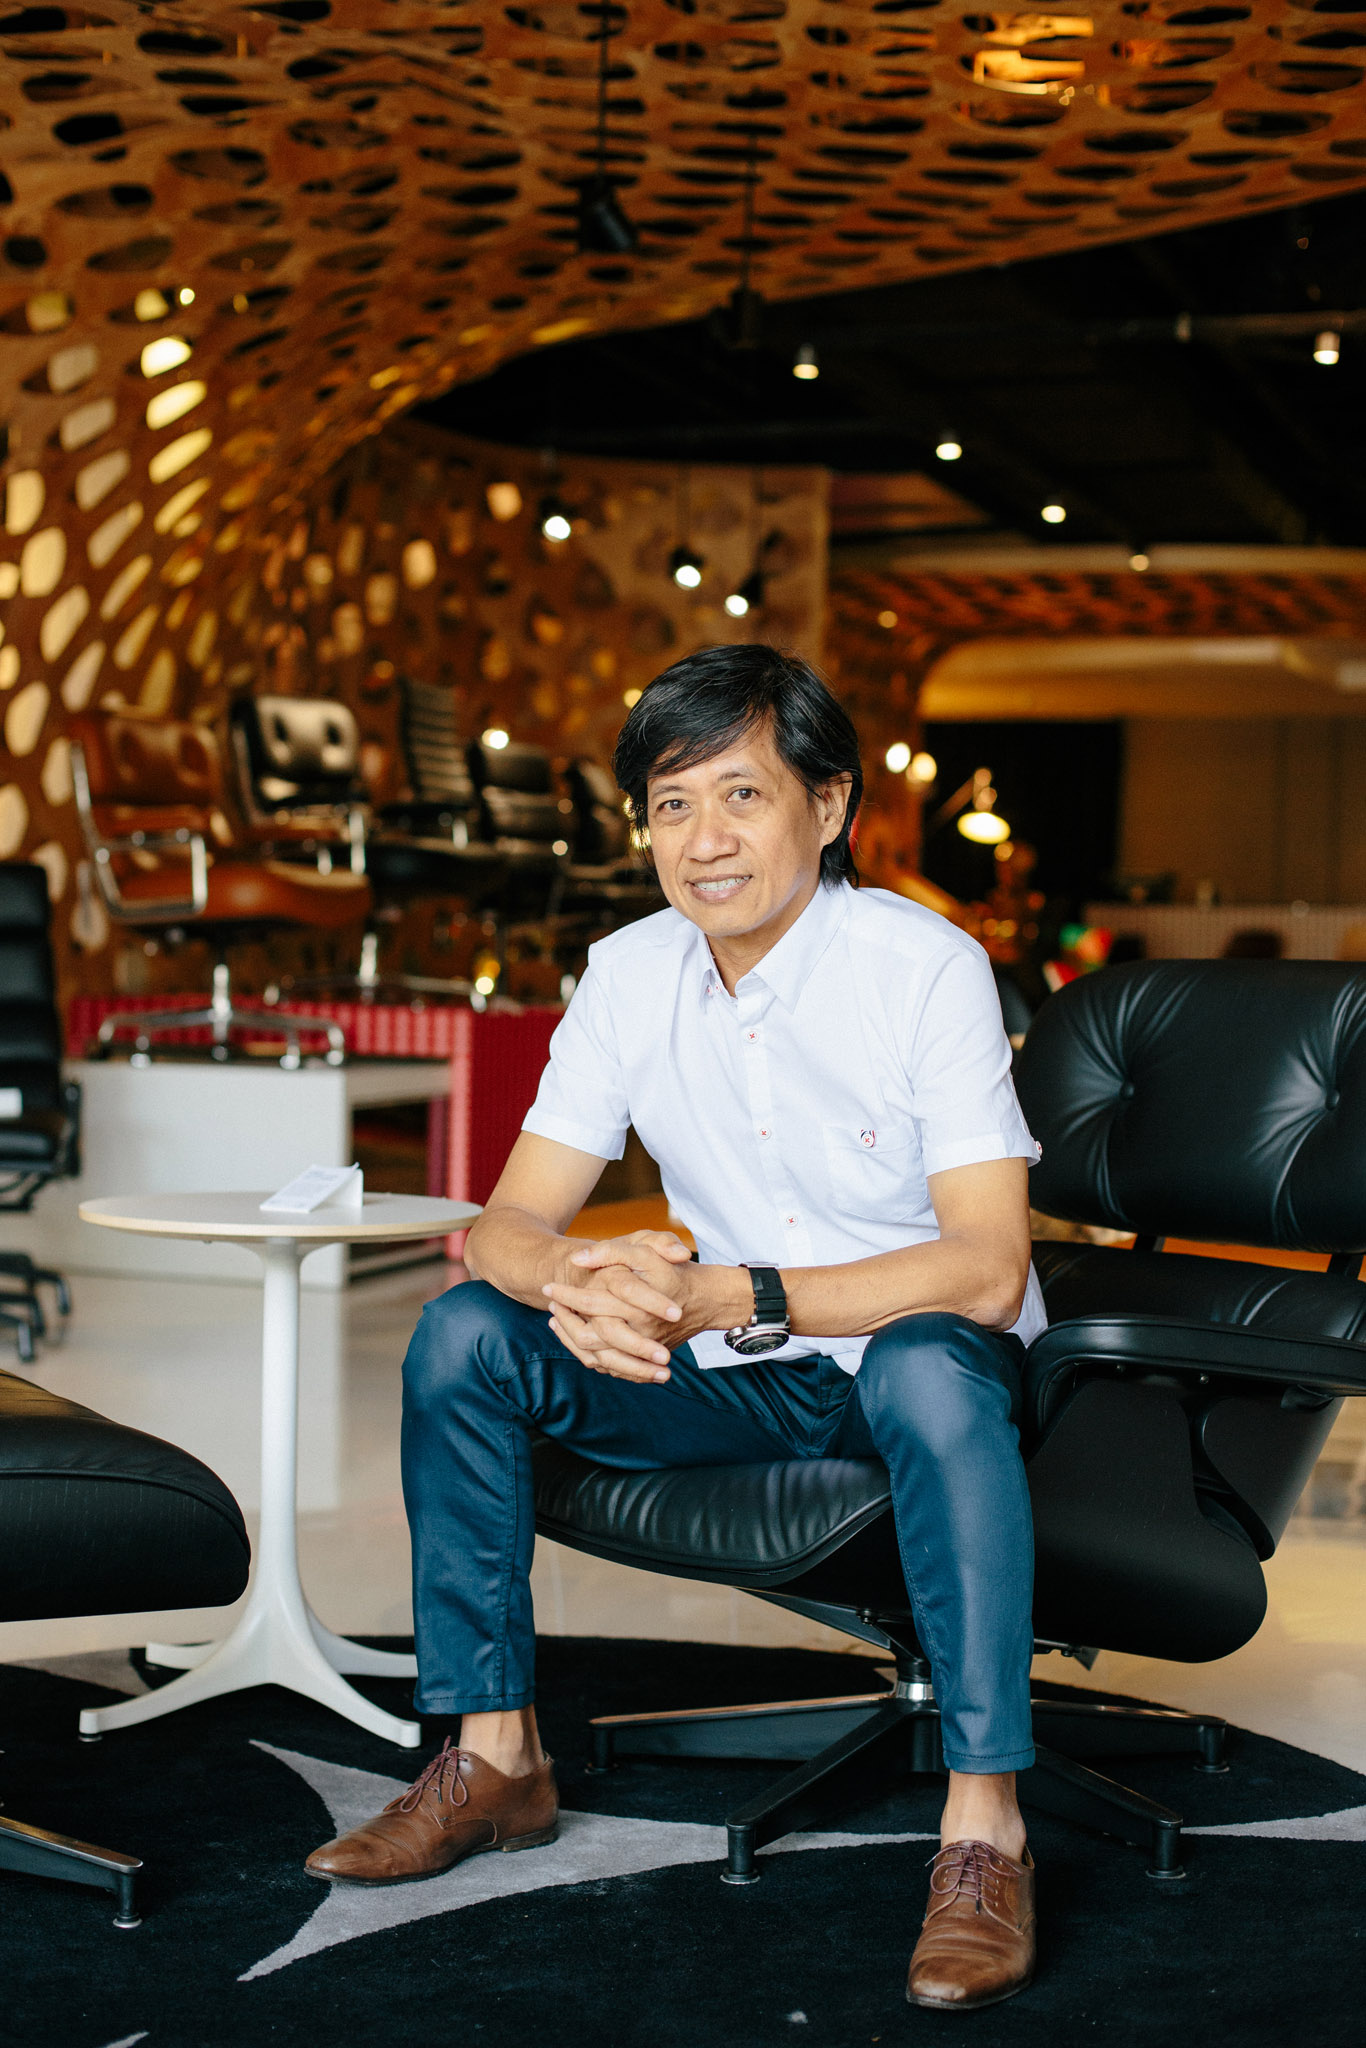 singapore-commercial-editorial-photographer-le-nouvel-obseveteur-singapore-creative-zakaria-zainal-30.jpg